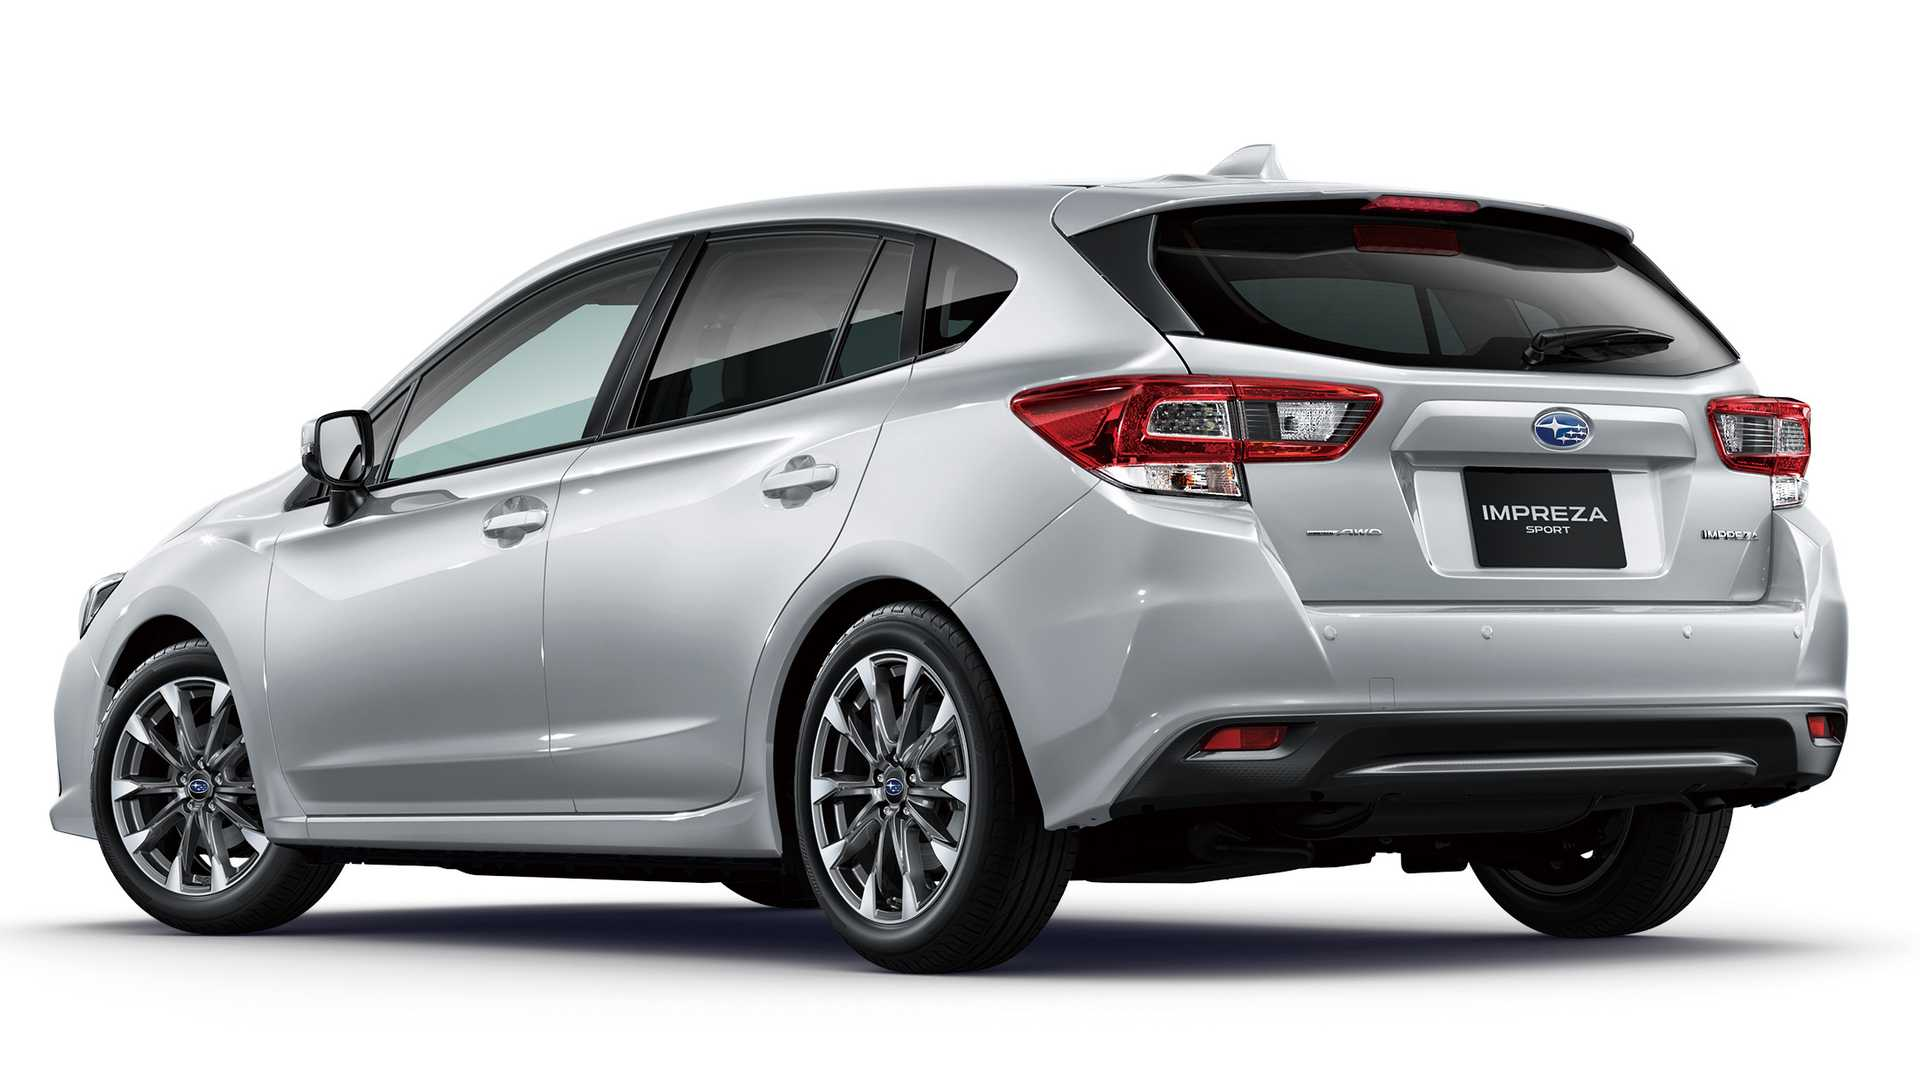 2020 Subaru Impreza Hatchback Review.2020 Subaru Impreza Revealed In Japan But Where S The Wrx